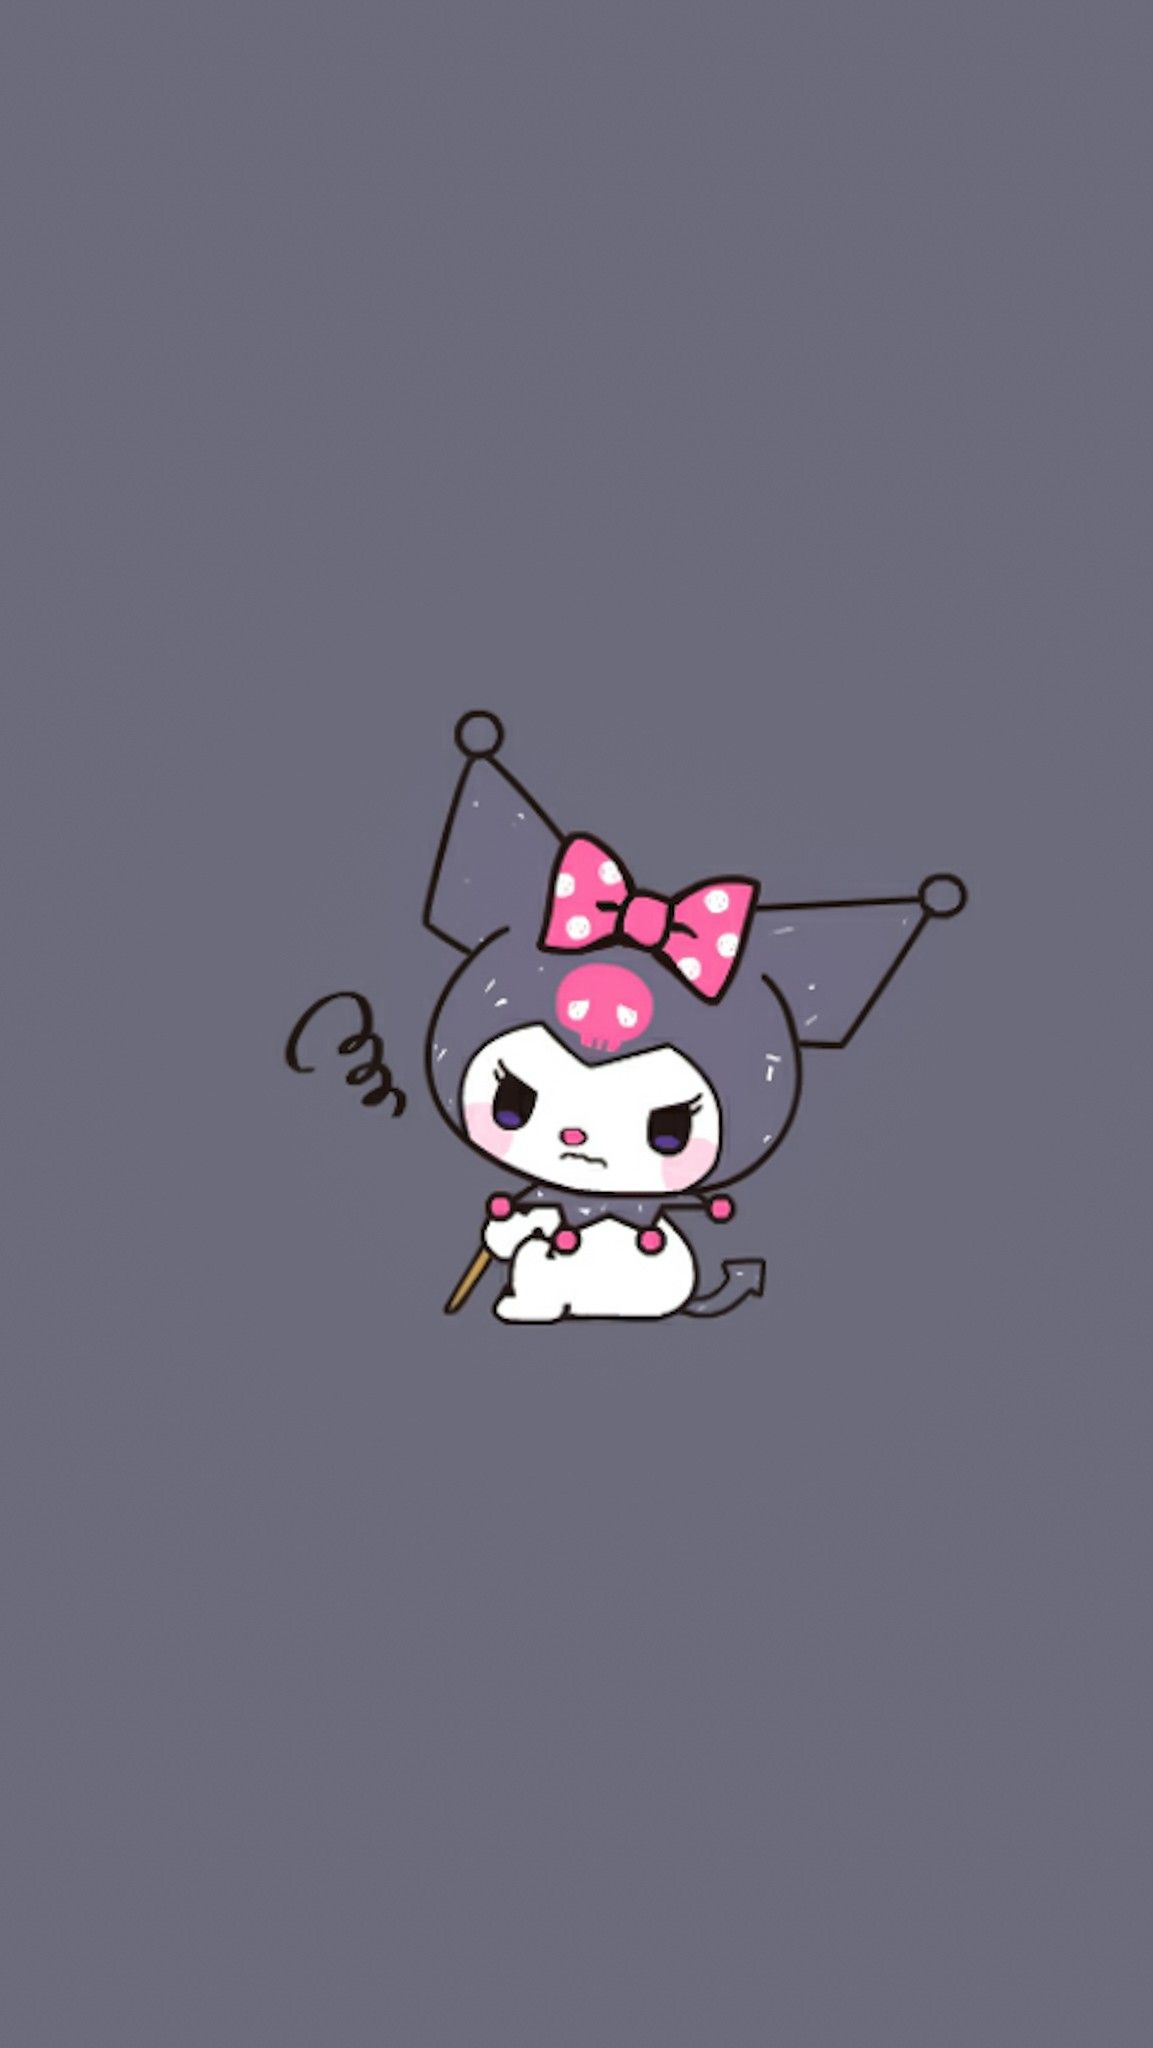 Pin By Aekkalisa On Kuromi Bg Hello Kitty Iphone Wallpaper Iphone Wallpaper Kawaii Kitty Wallpaper